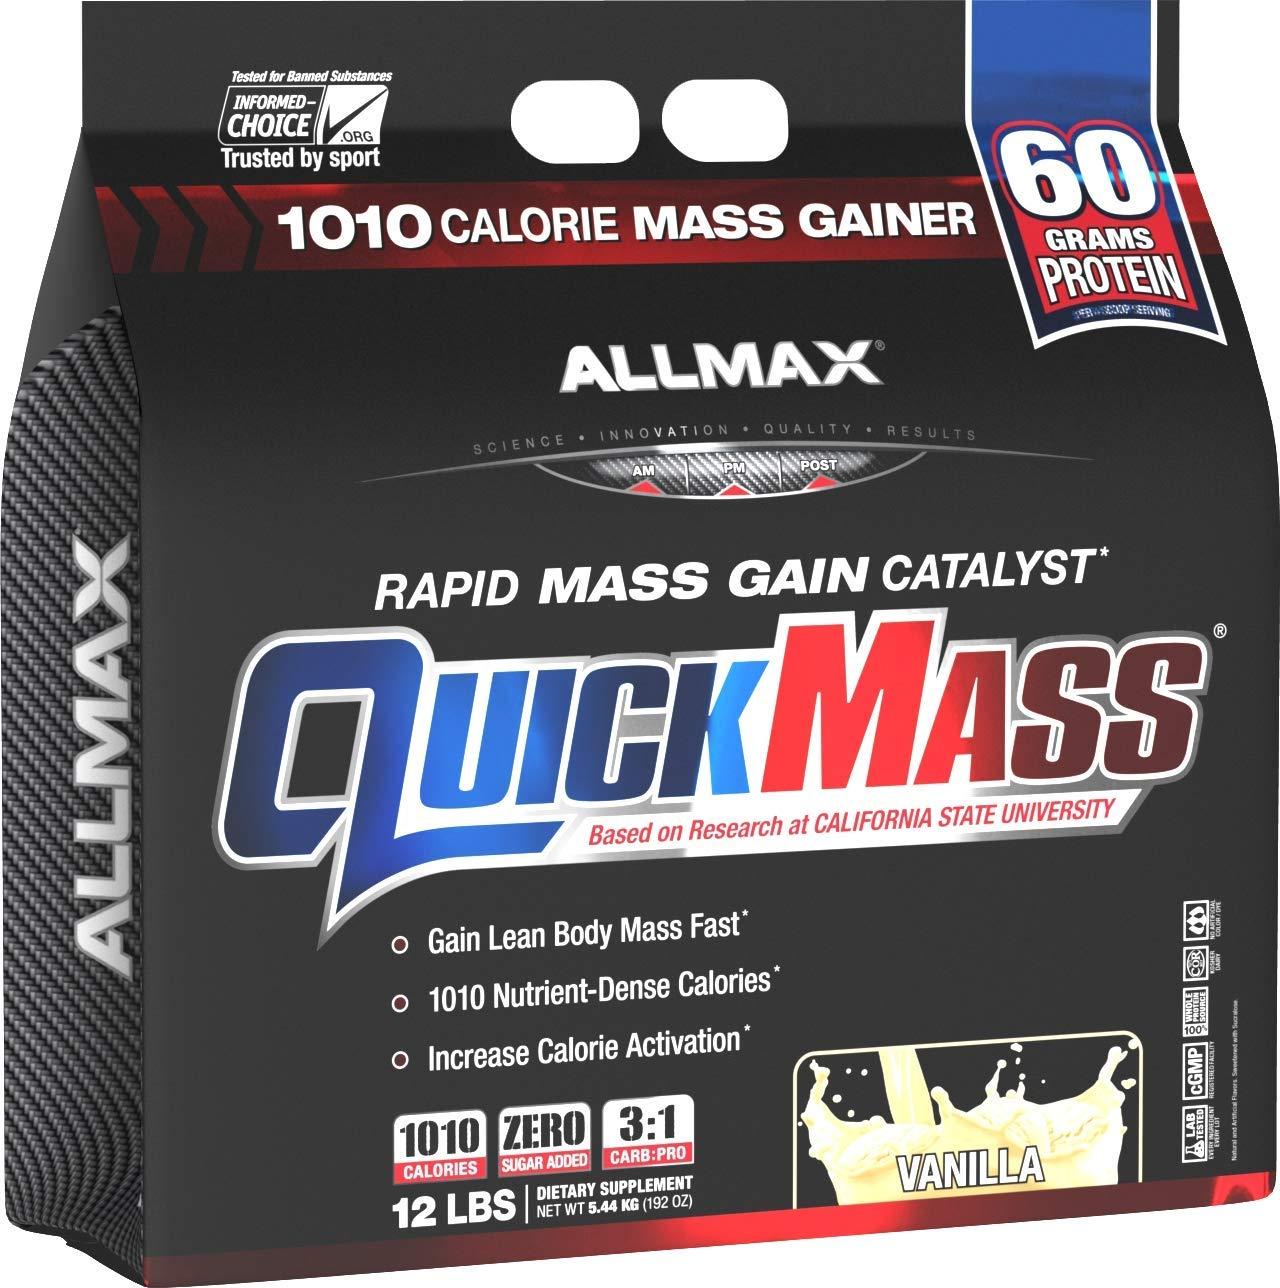 ALLMAX Nutrition QuickMass Rapid Mass Gain Catalyst, Vanilla, 12 lbs